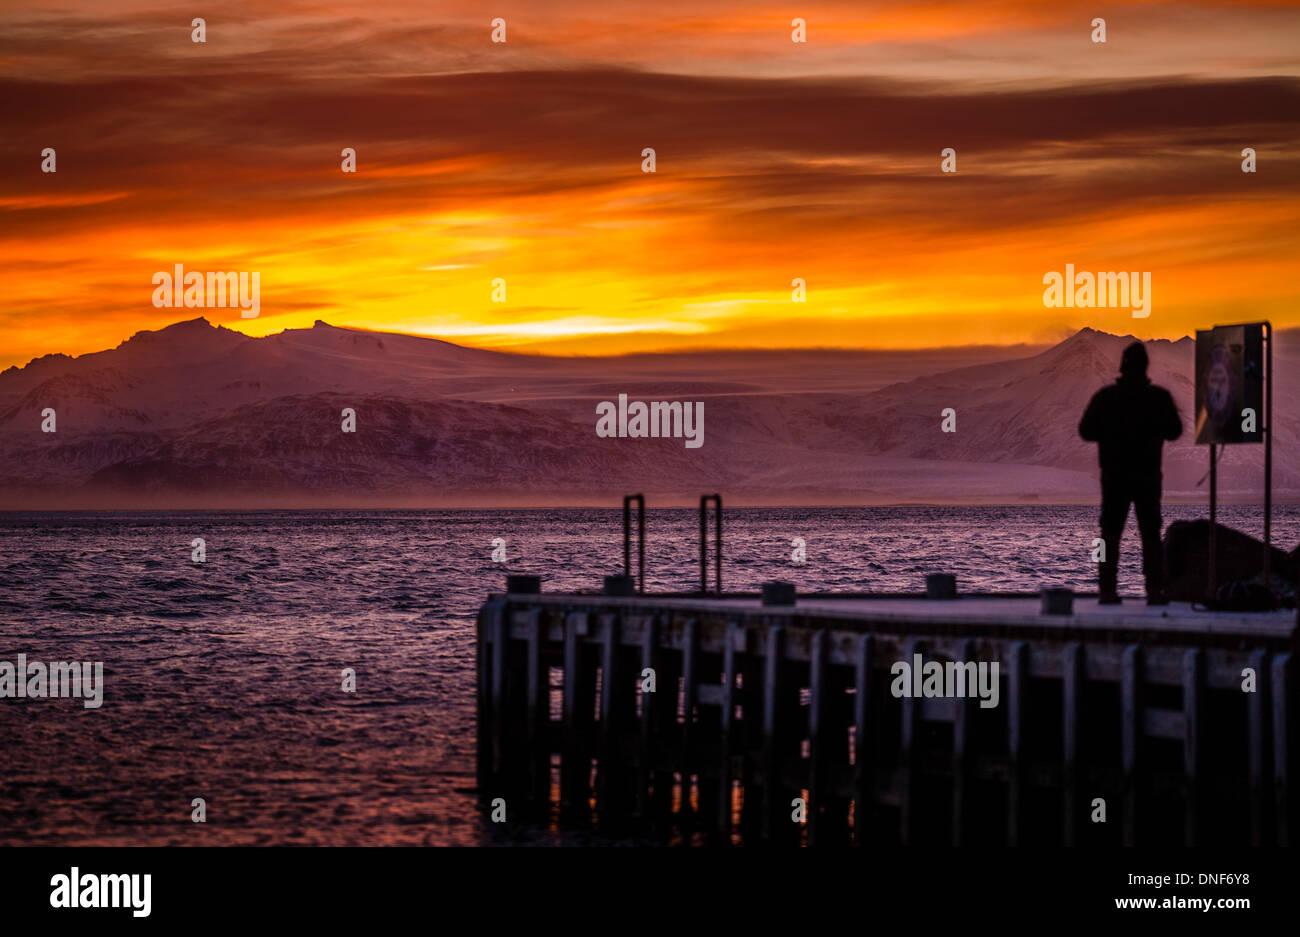 EUROPE HOFN ICELAND TRAVEL VATNAJOKULL GLACIER Stock Photo